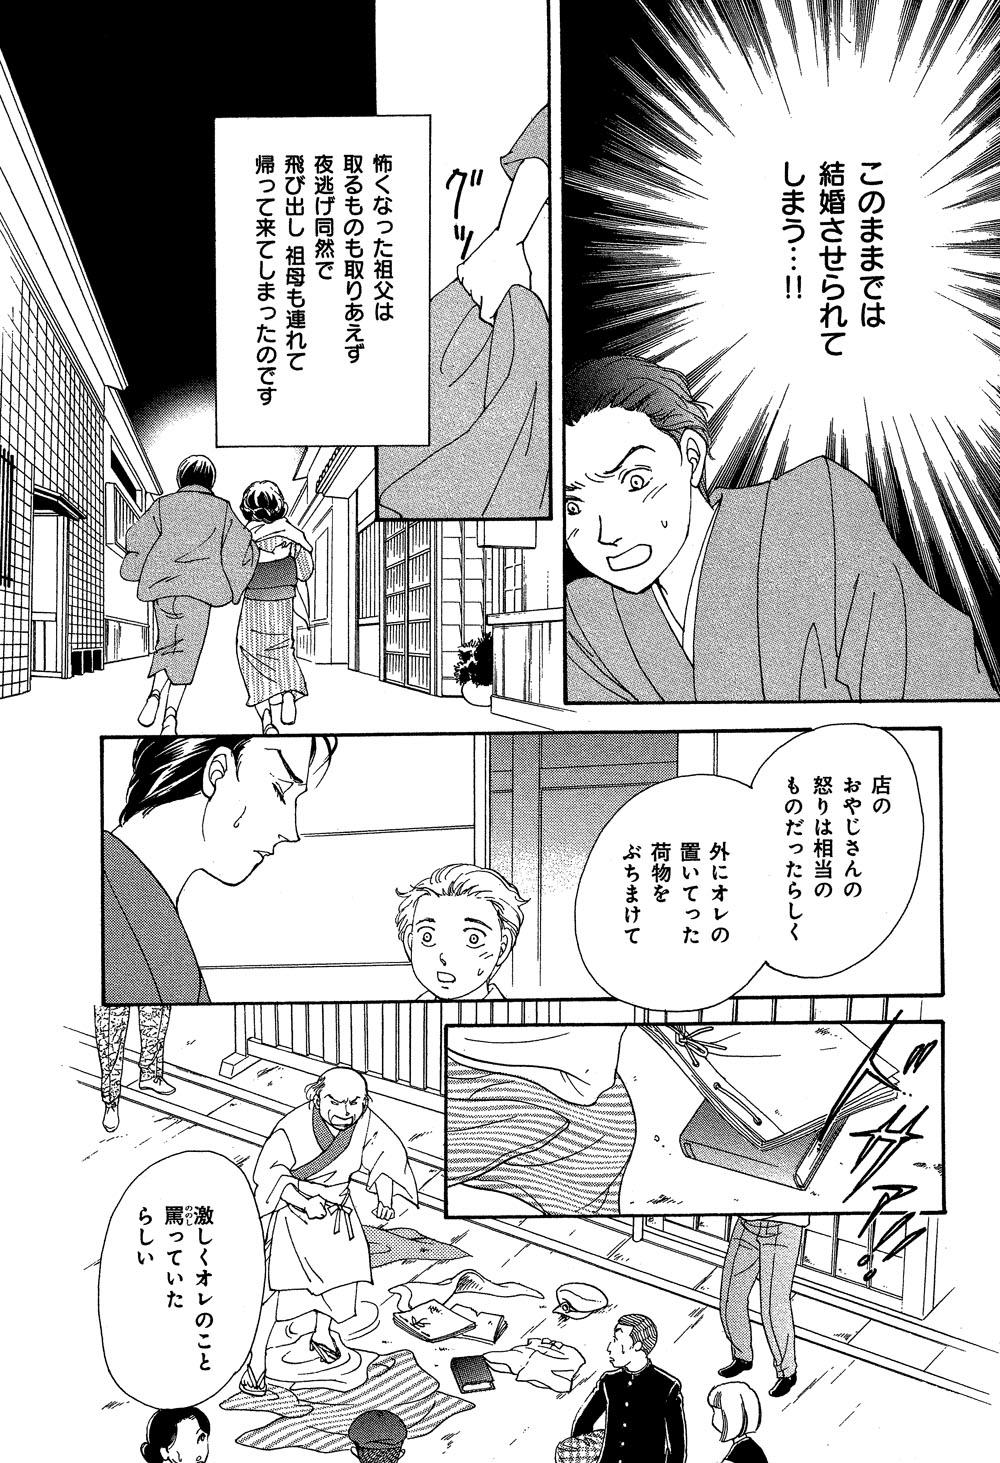 mayuri_0001_0142.jpg